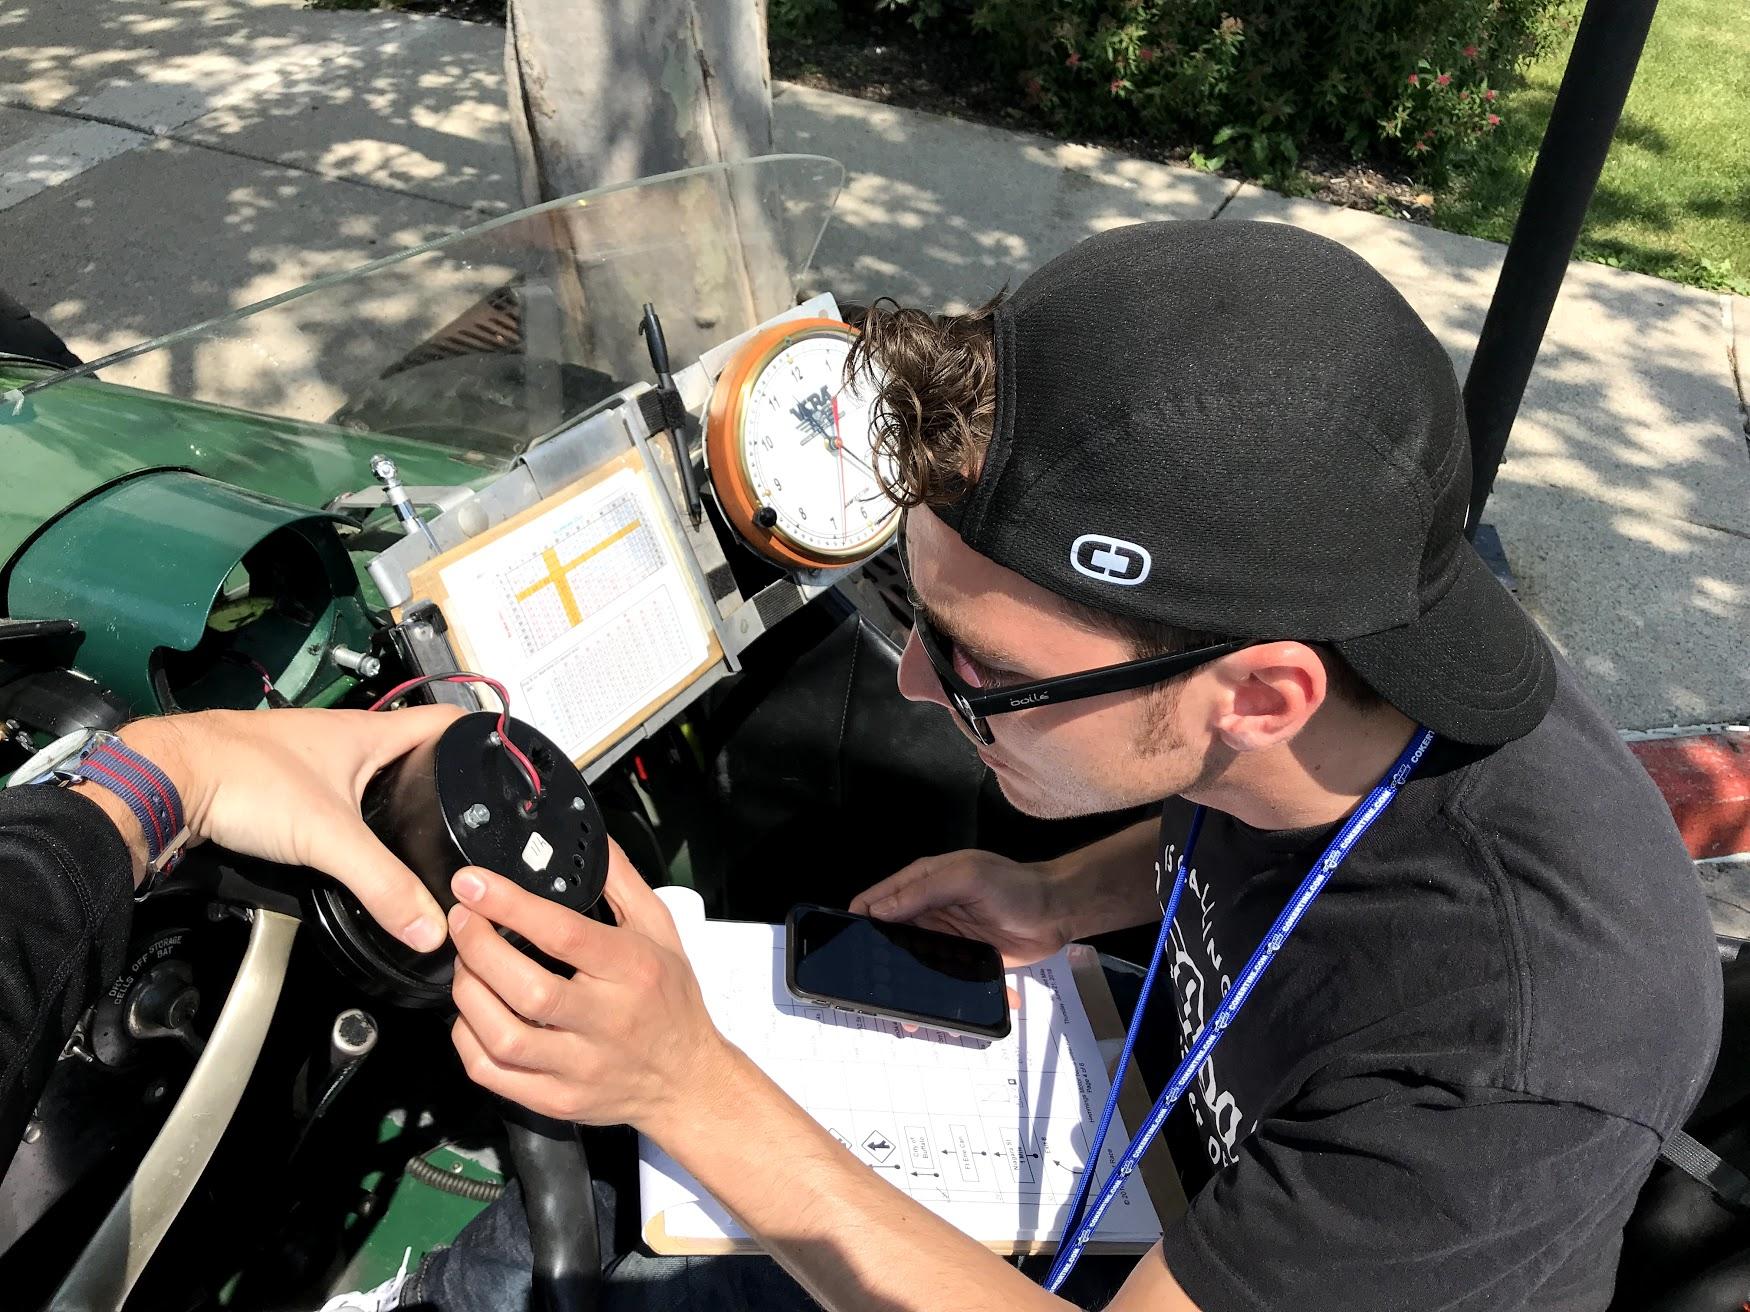 Calibrating the speedometer